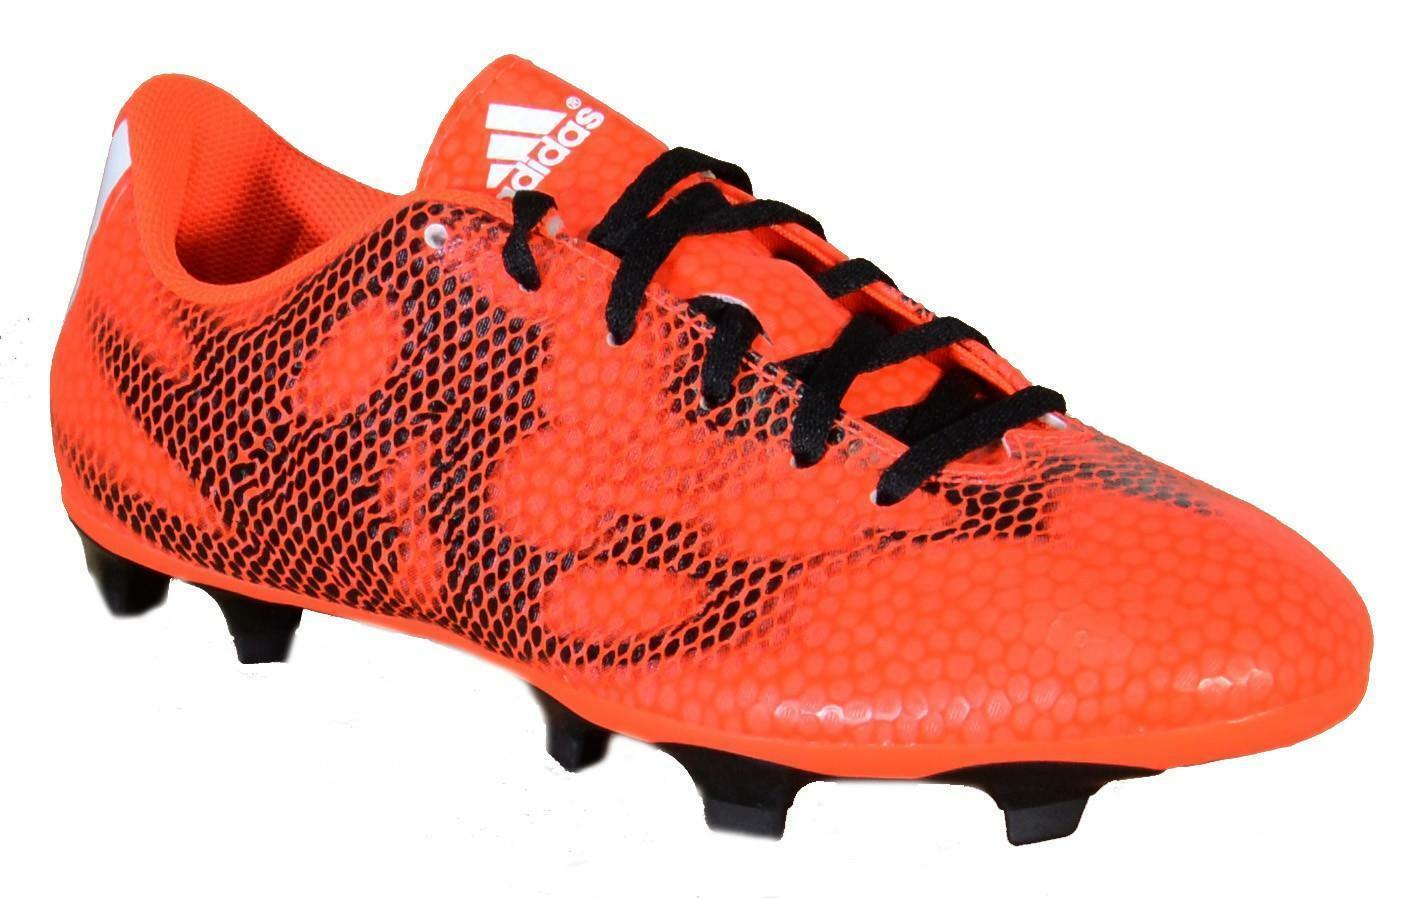 de rossi adidas rugby